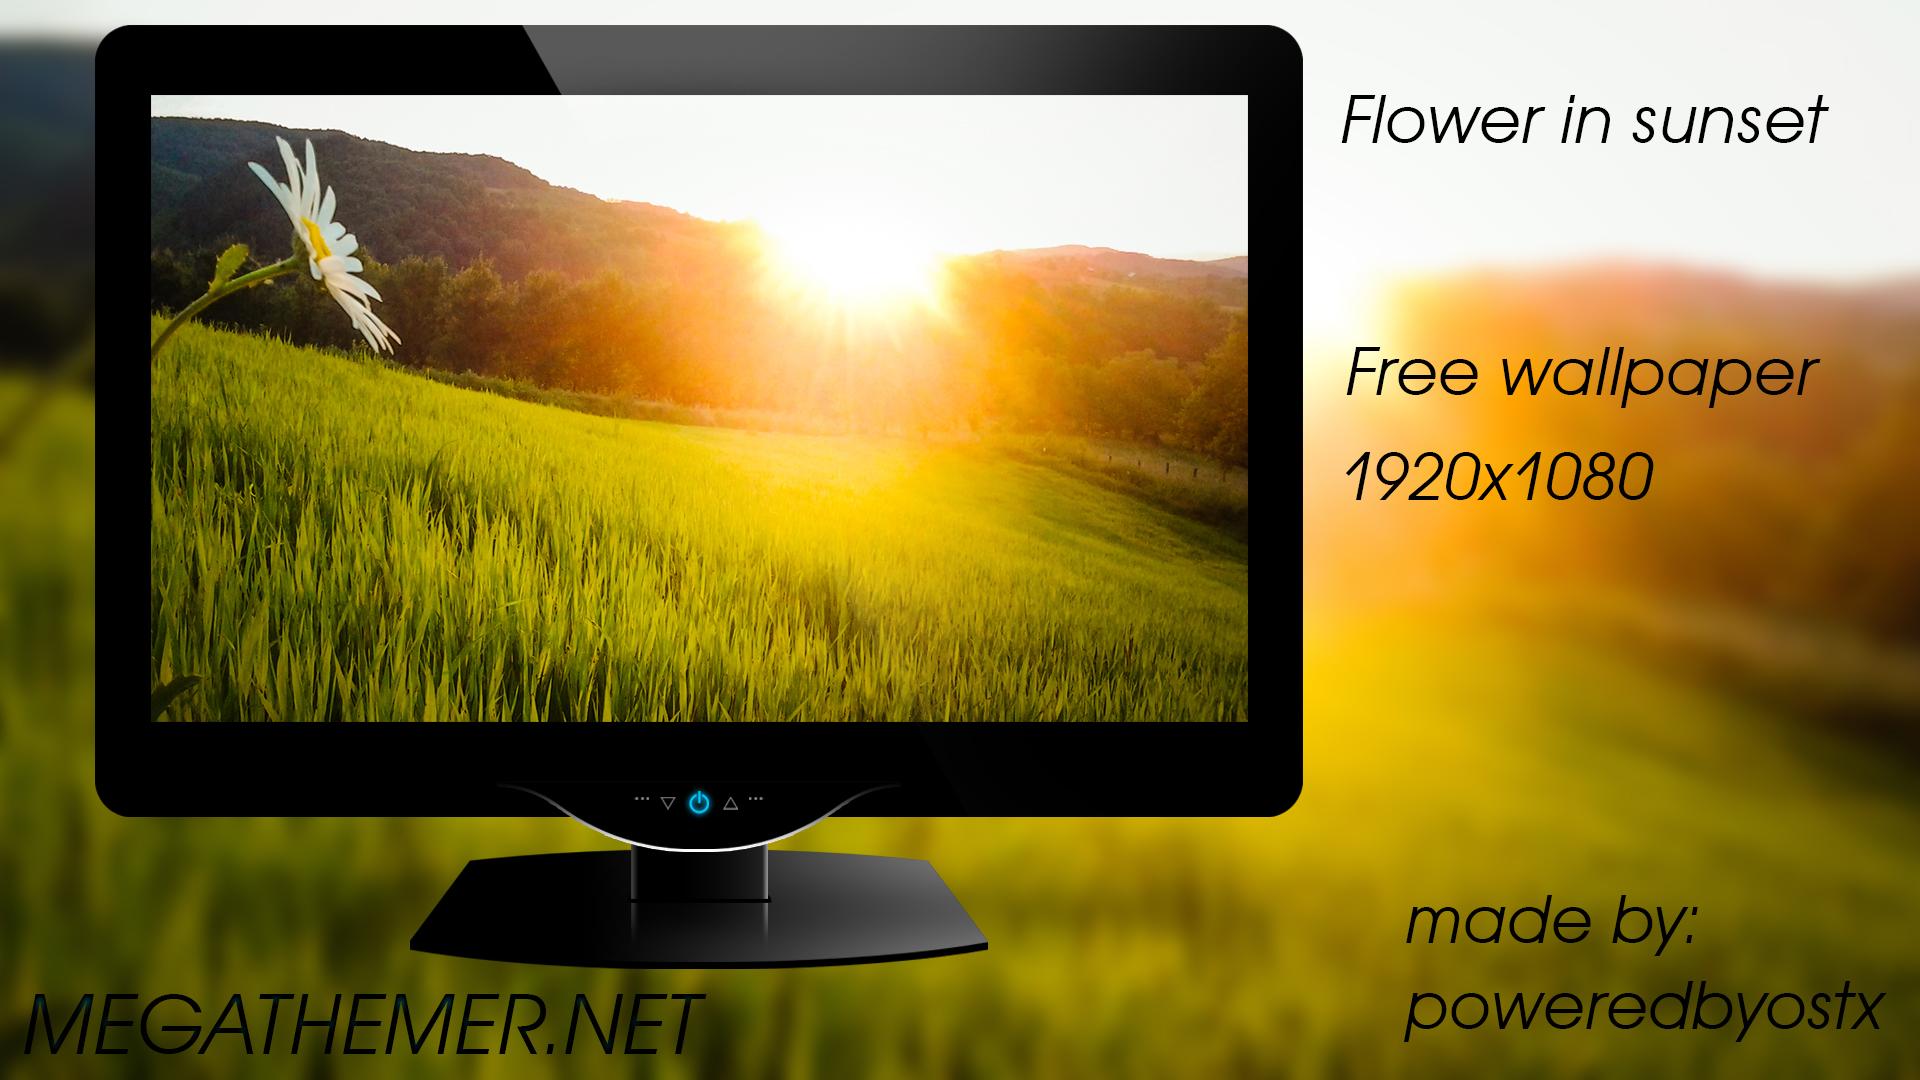 Flower in sunset by poweredbyostx